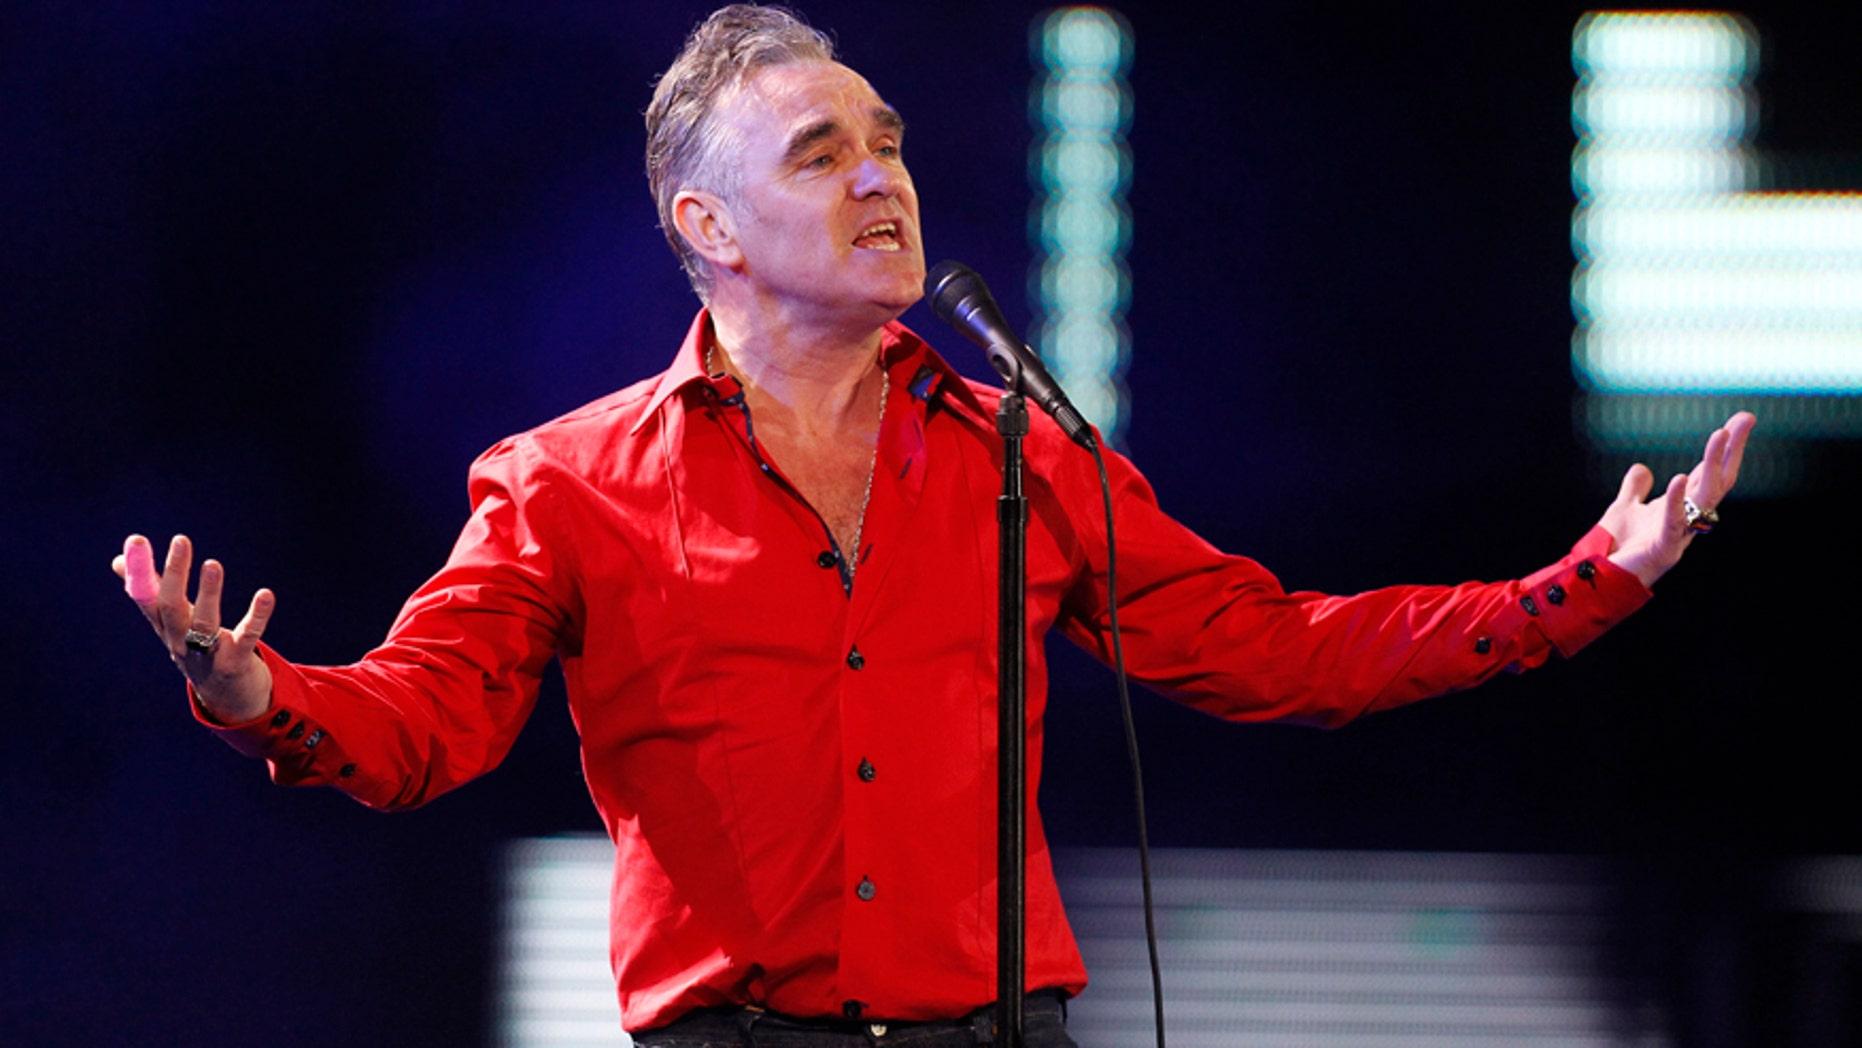 British singer-songwriter Morrissey performs.